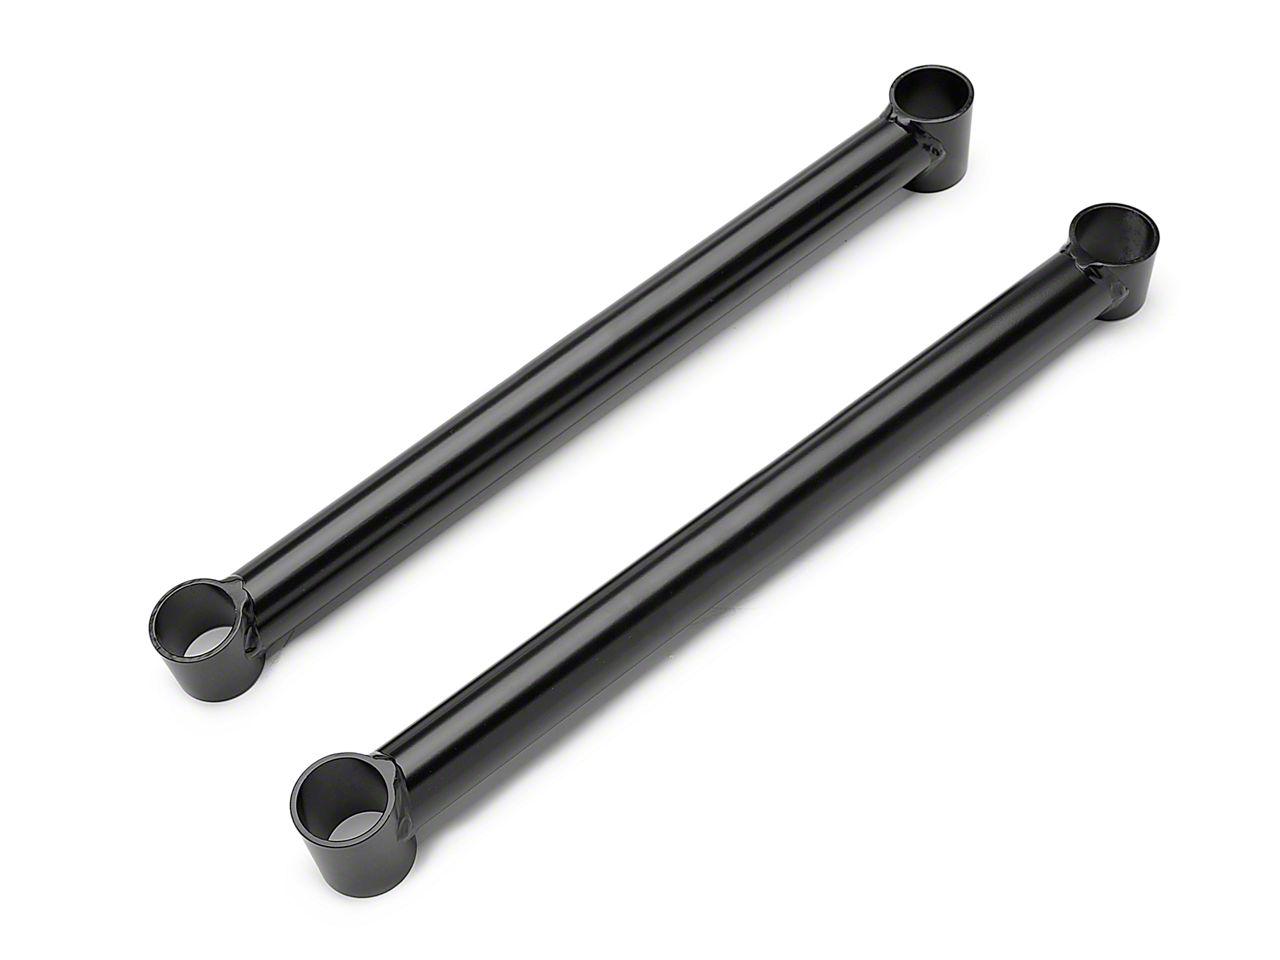 J&M Rear Lower Control Arms - Black (05-14 All)